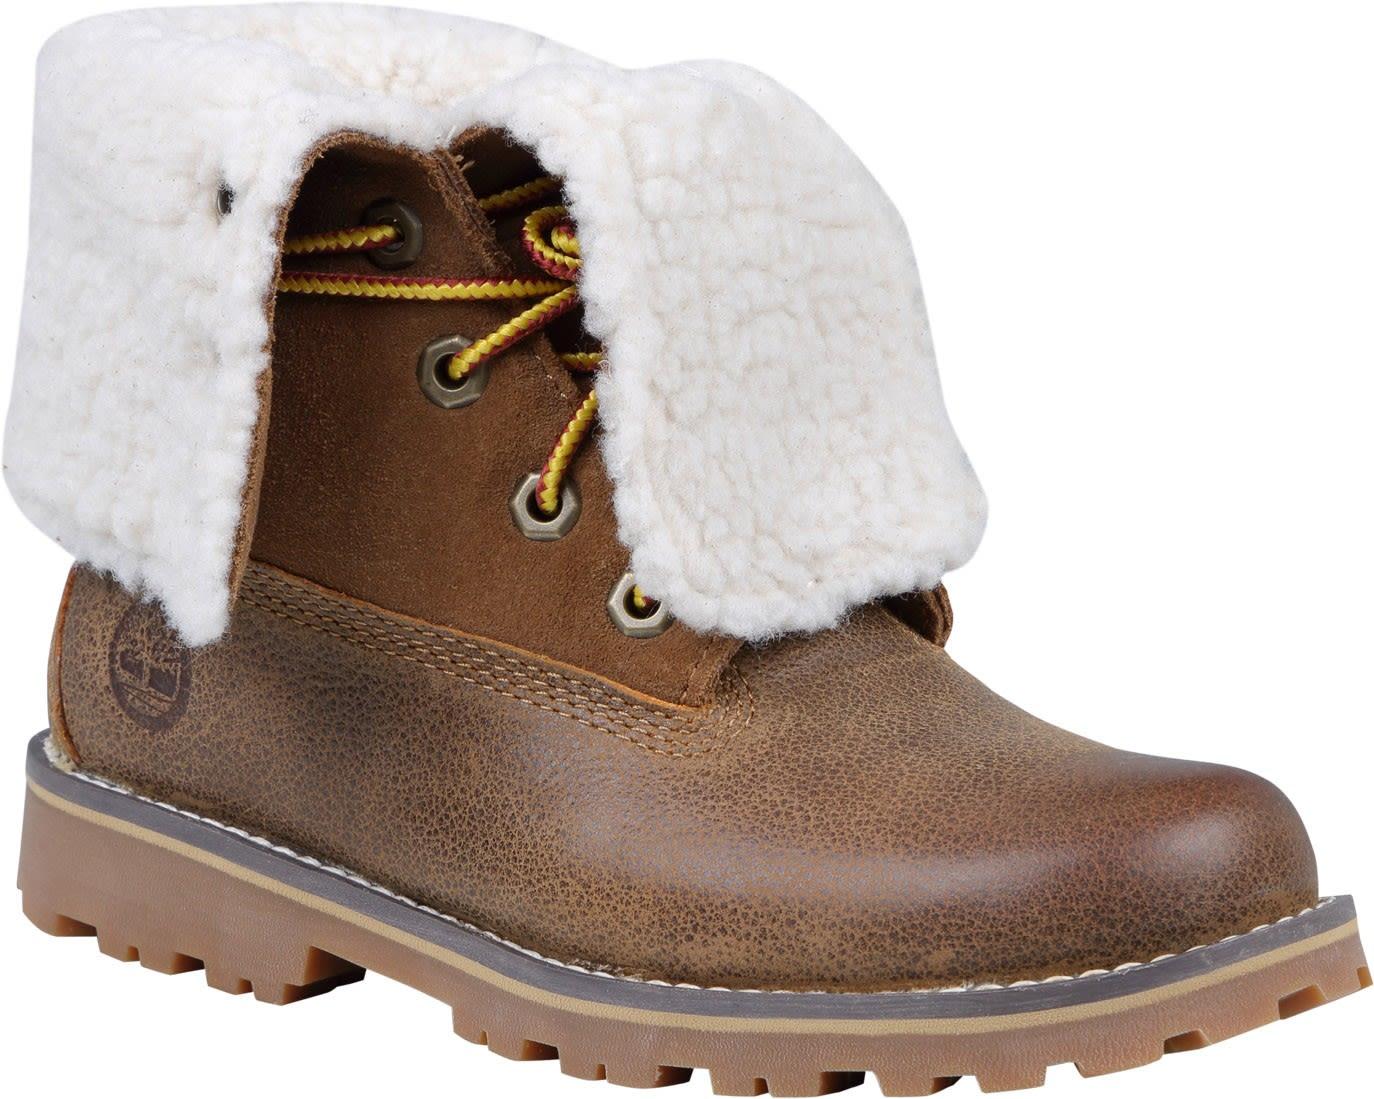 Timberland Youth 6-Inch Waterproof Faux Fur Boot Braun, EU 32 -Farbe Dark Sudan